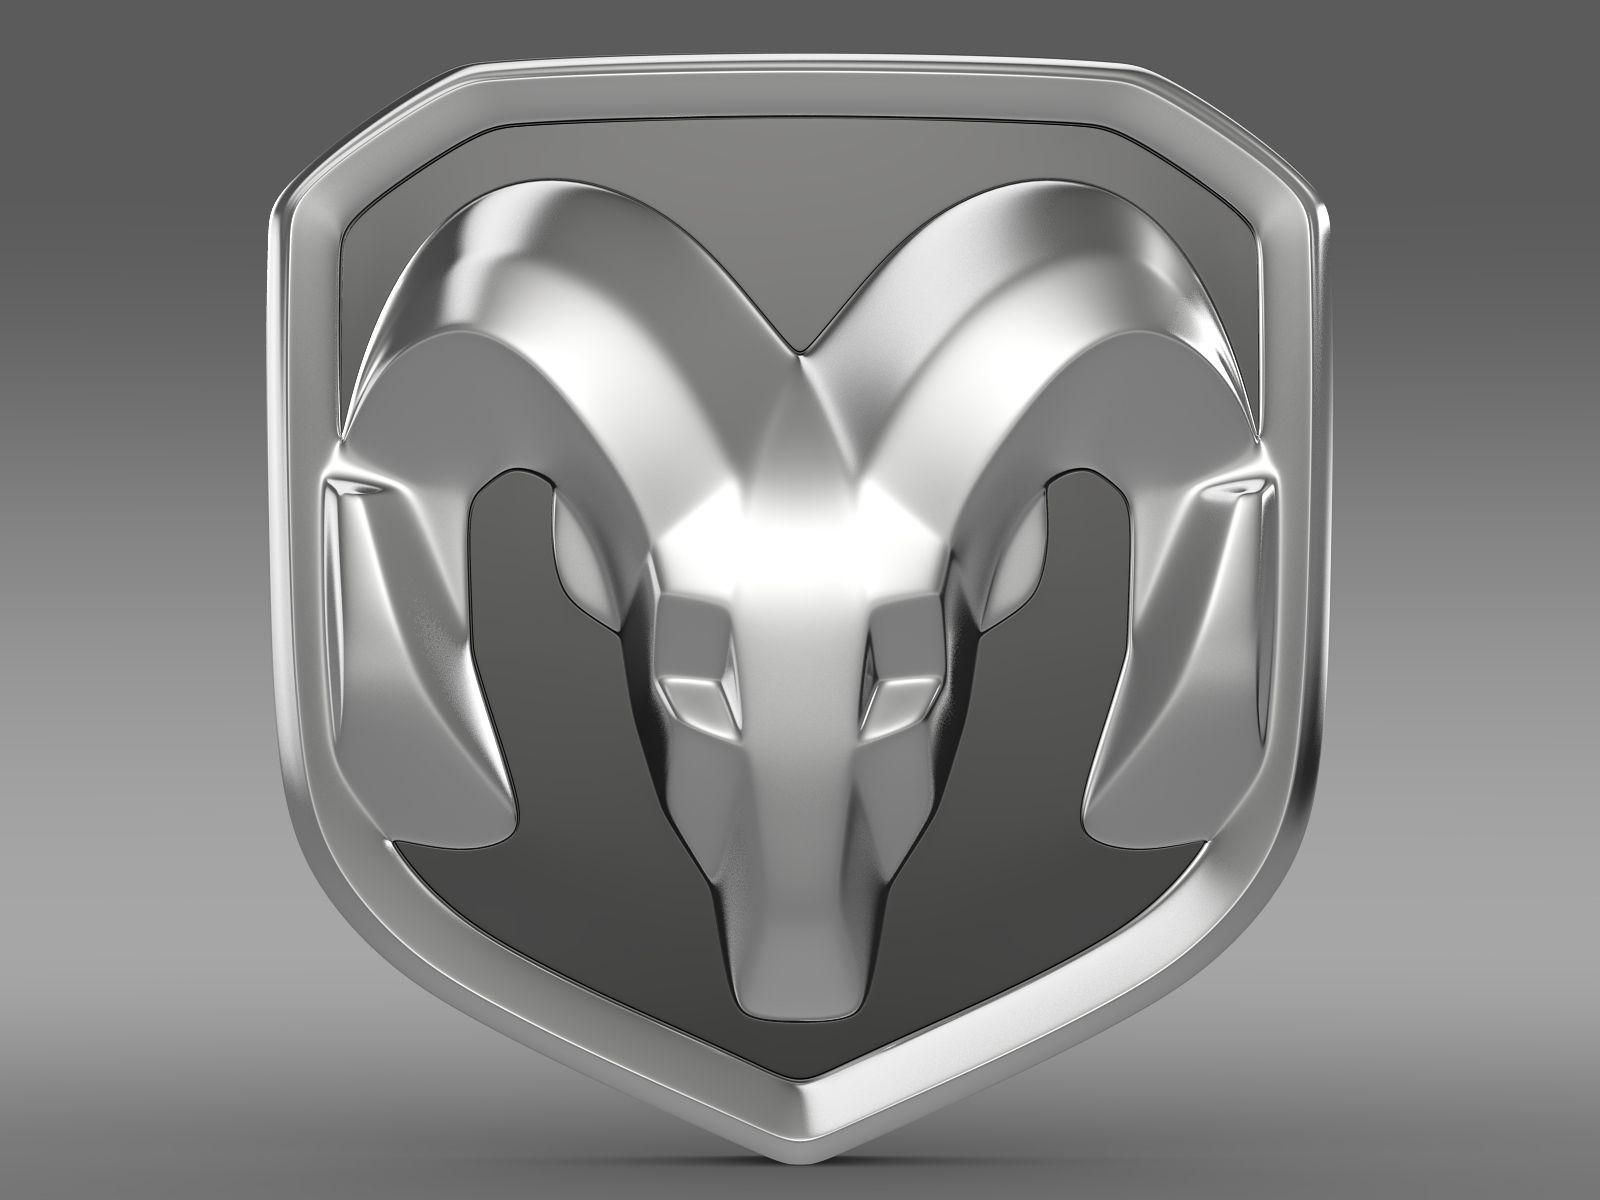 Dodge ram logo 3d model max obj 3ds fbx c4d lwo lw lws - Ram logo images ...